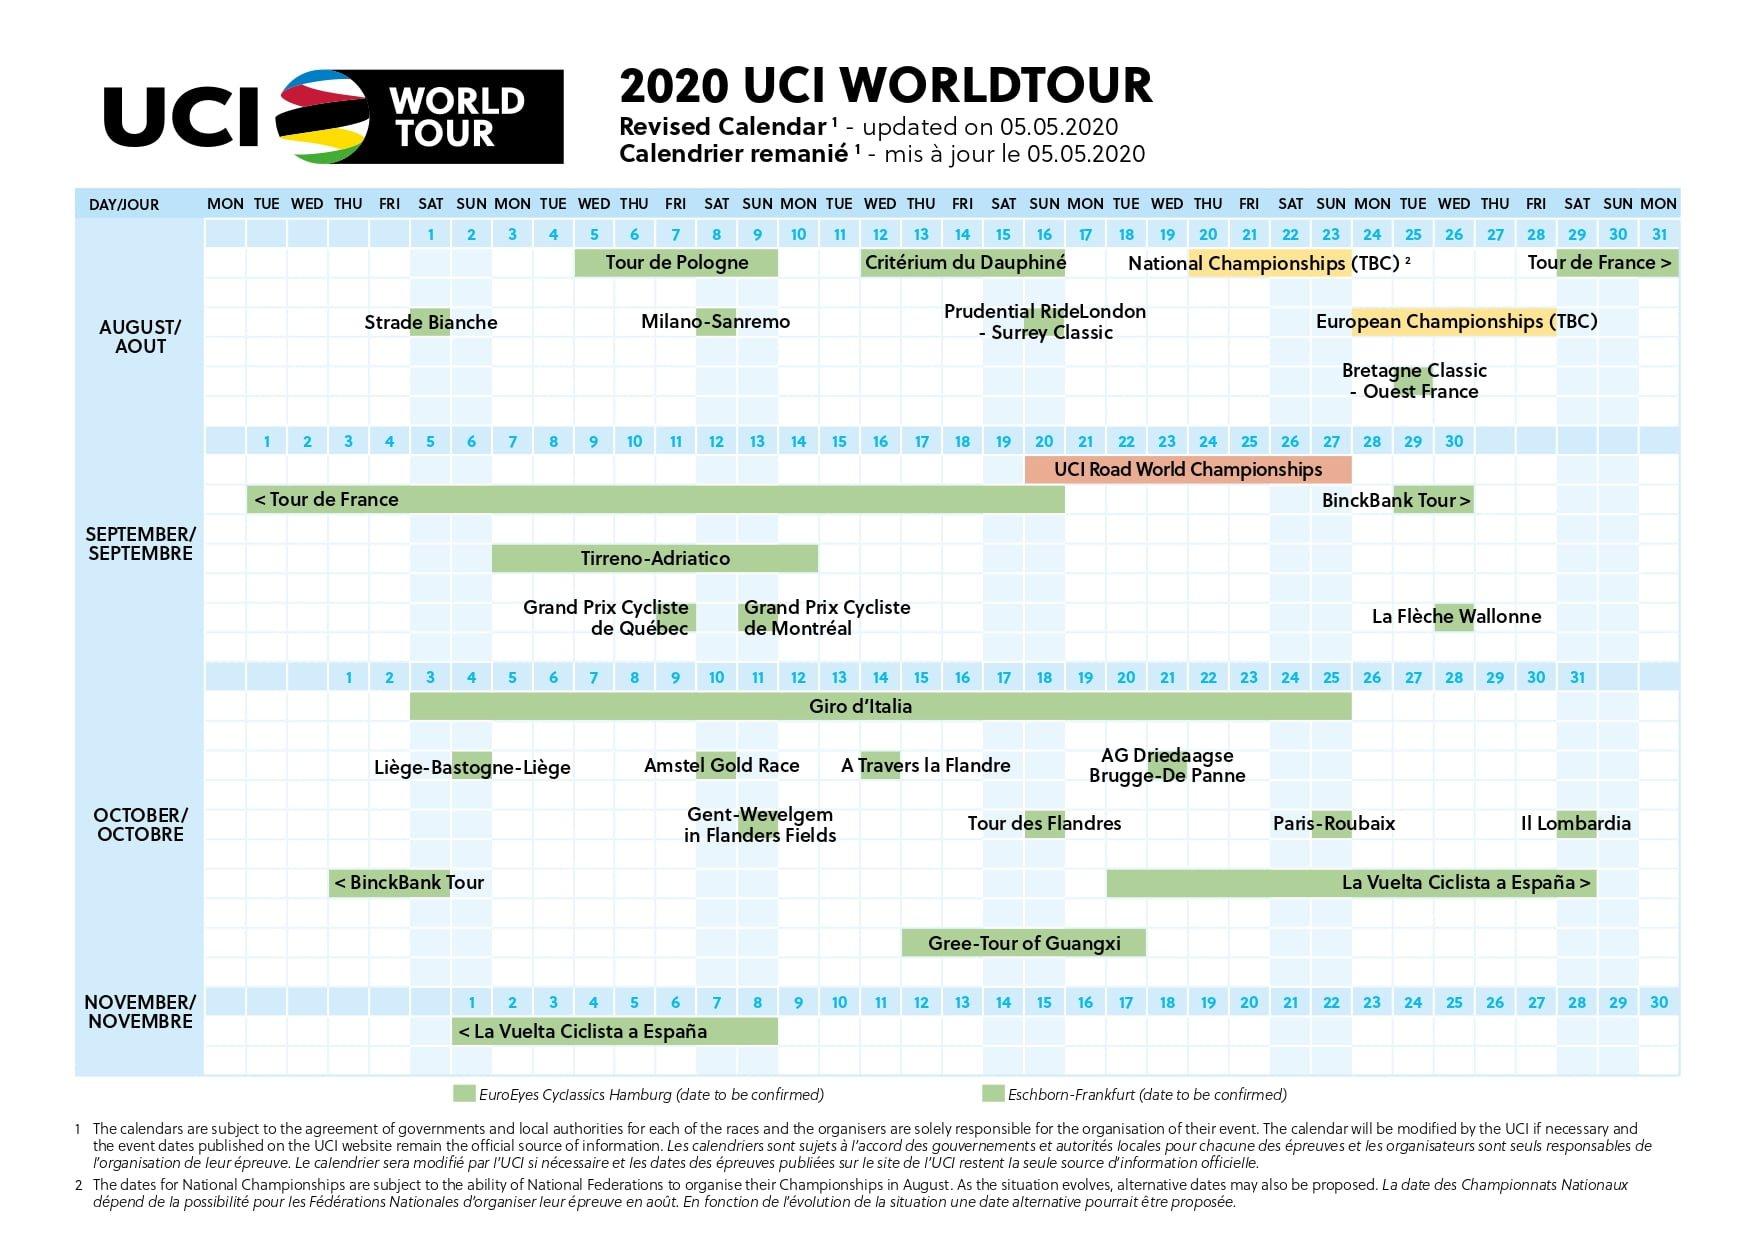 Calendario UCI World Tour